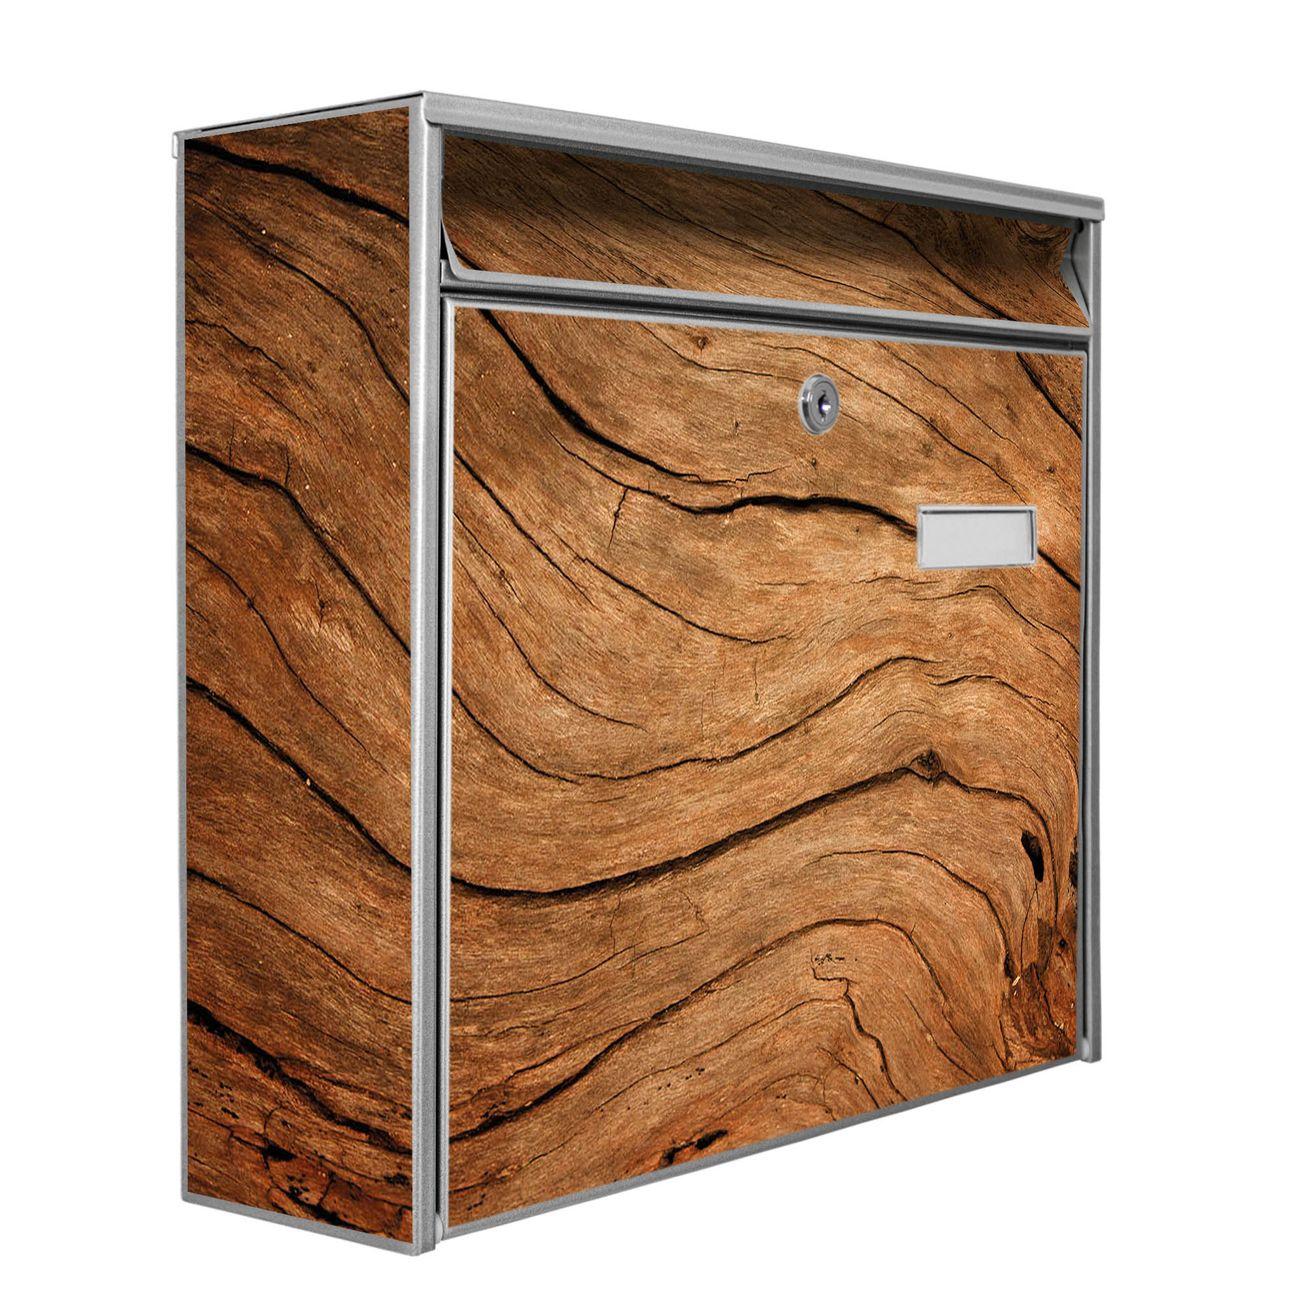 Burg-Wächter Mail Trockenes Holz